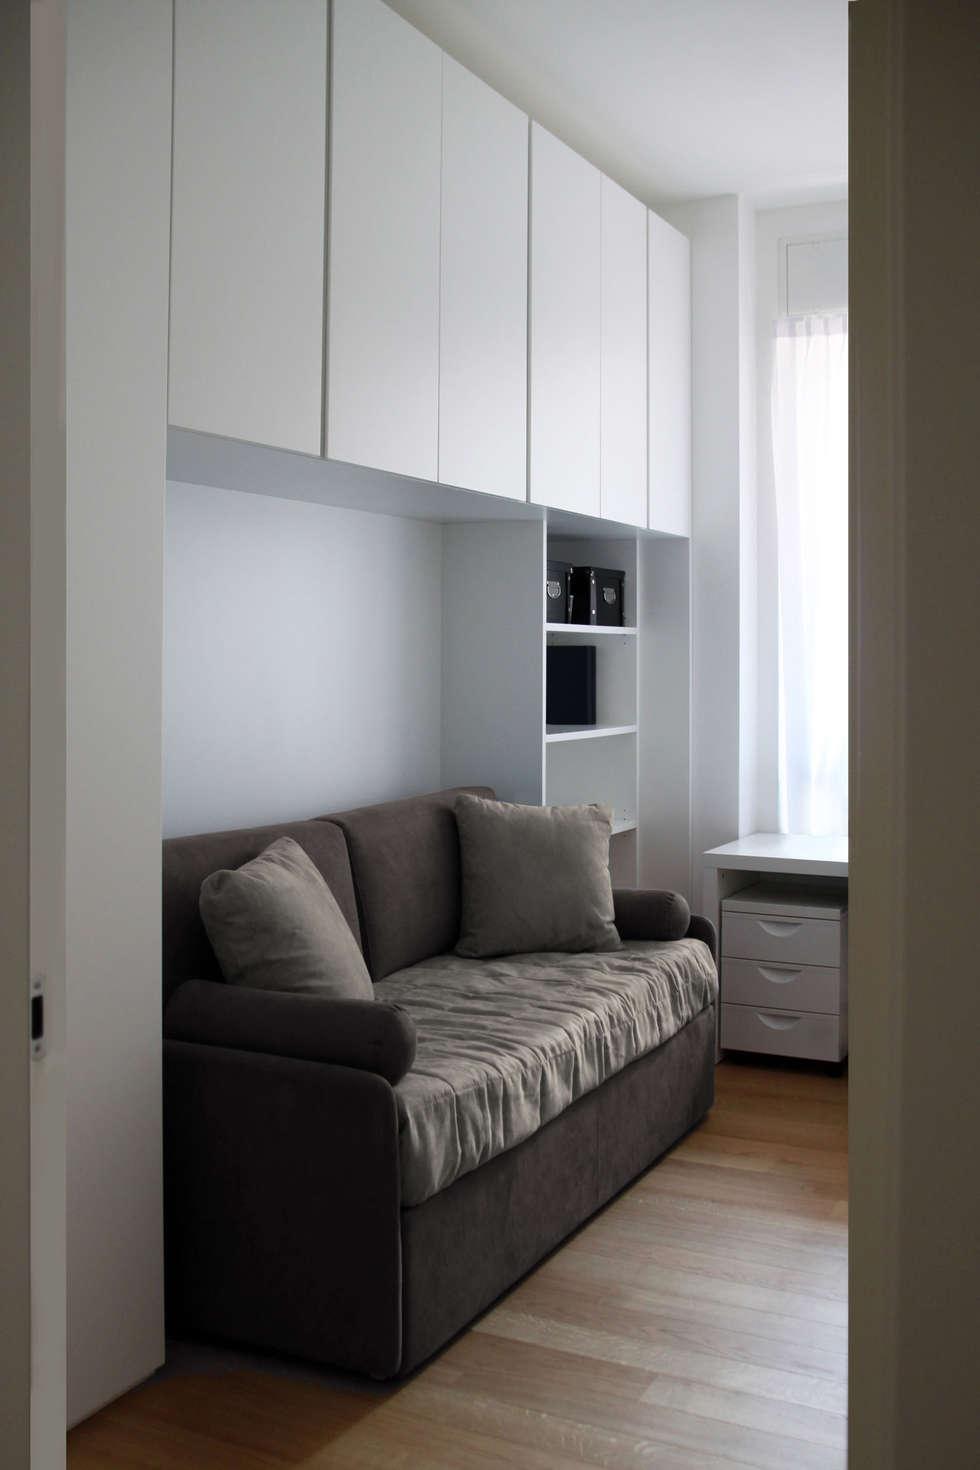 studio camera ospiti: Sala multimediale in stile  di T+T ARCHITETTURA